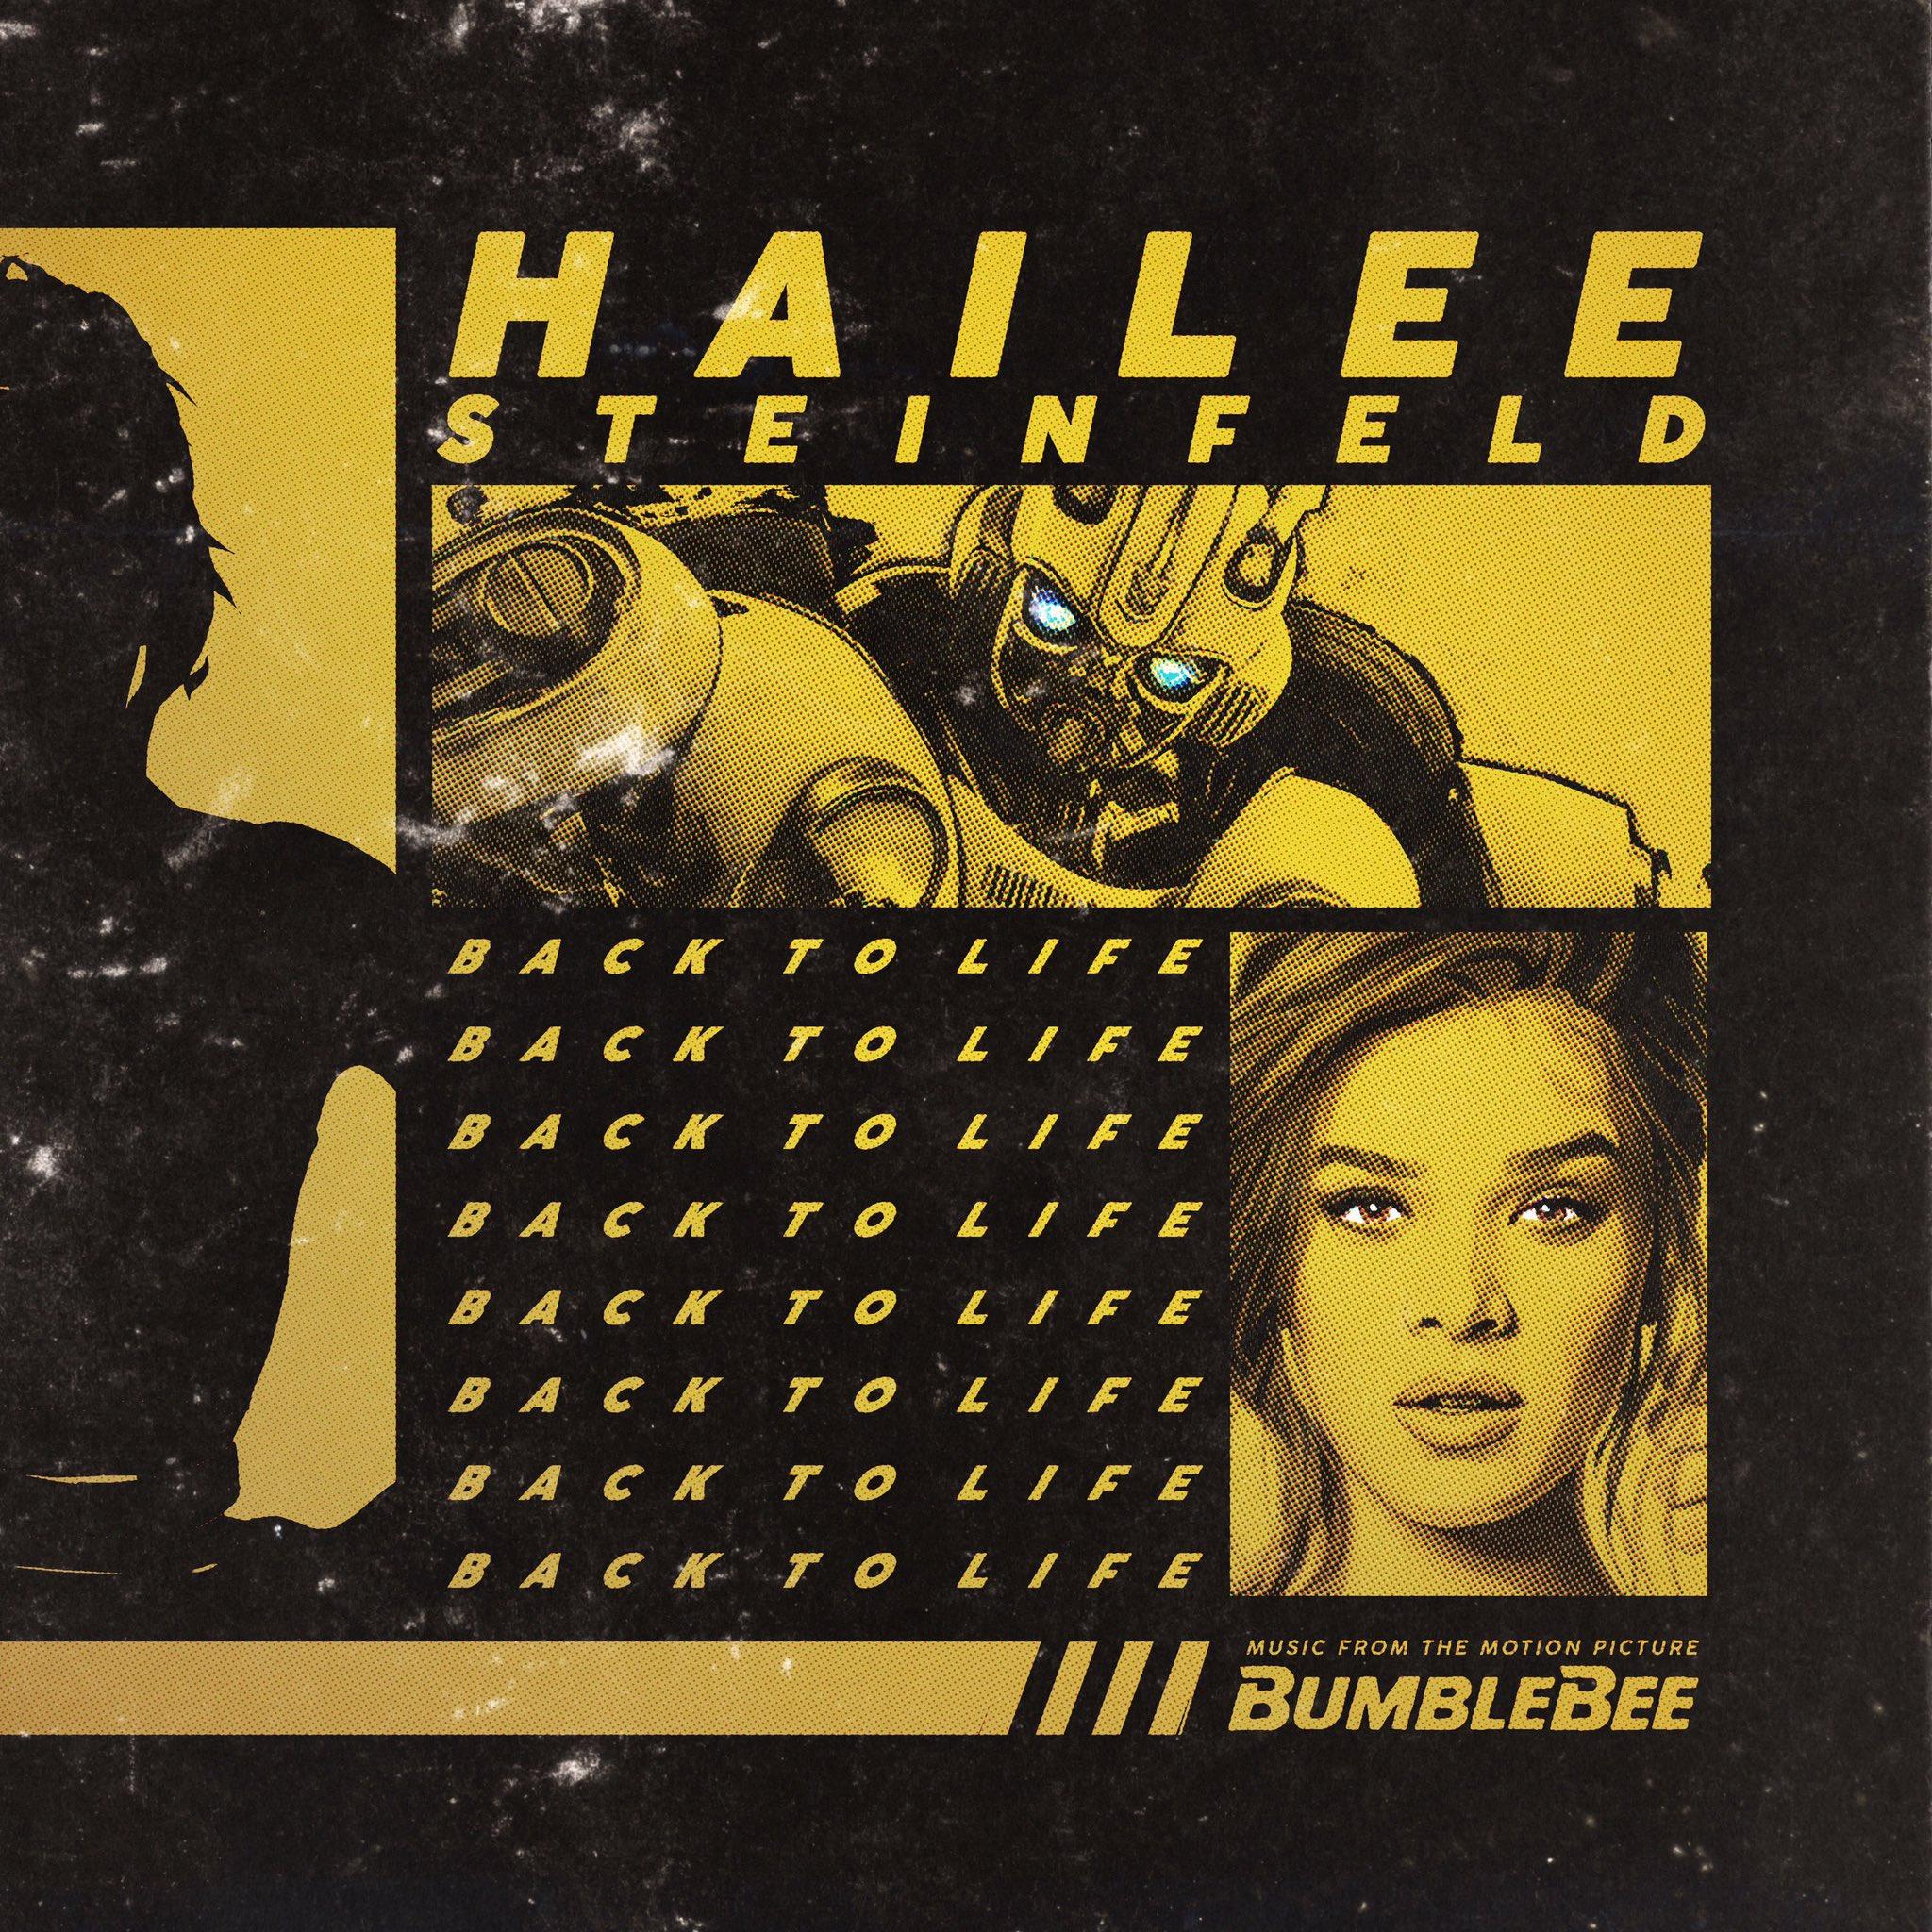 Hailee Steinfeld @ HaileeSteinfeld